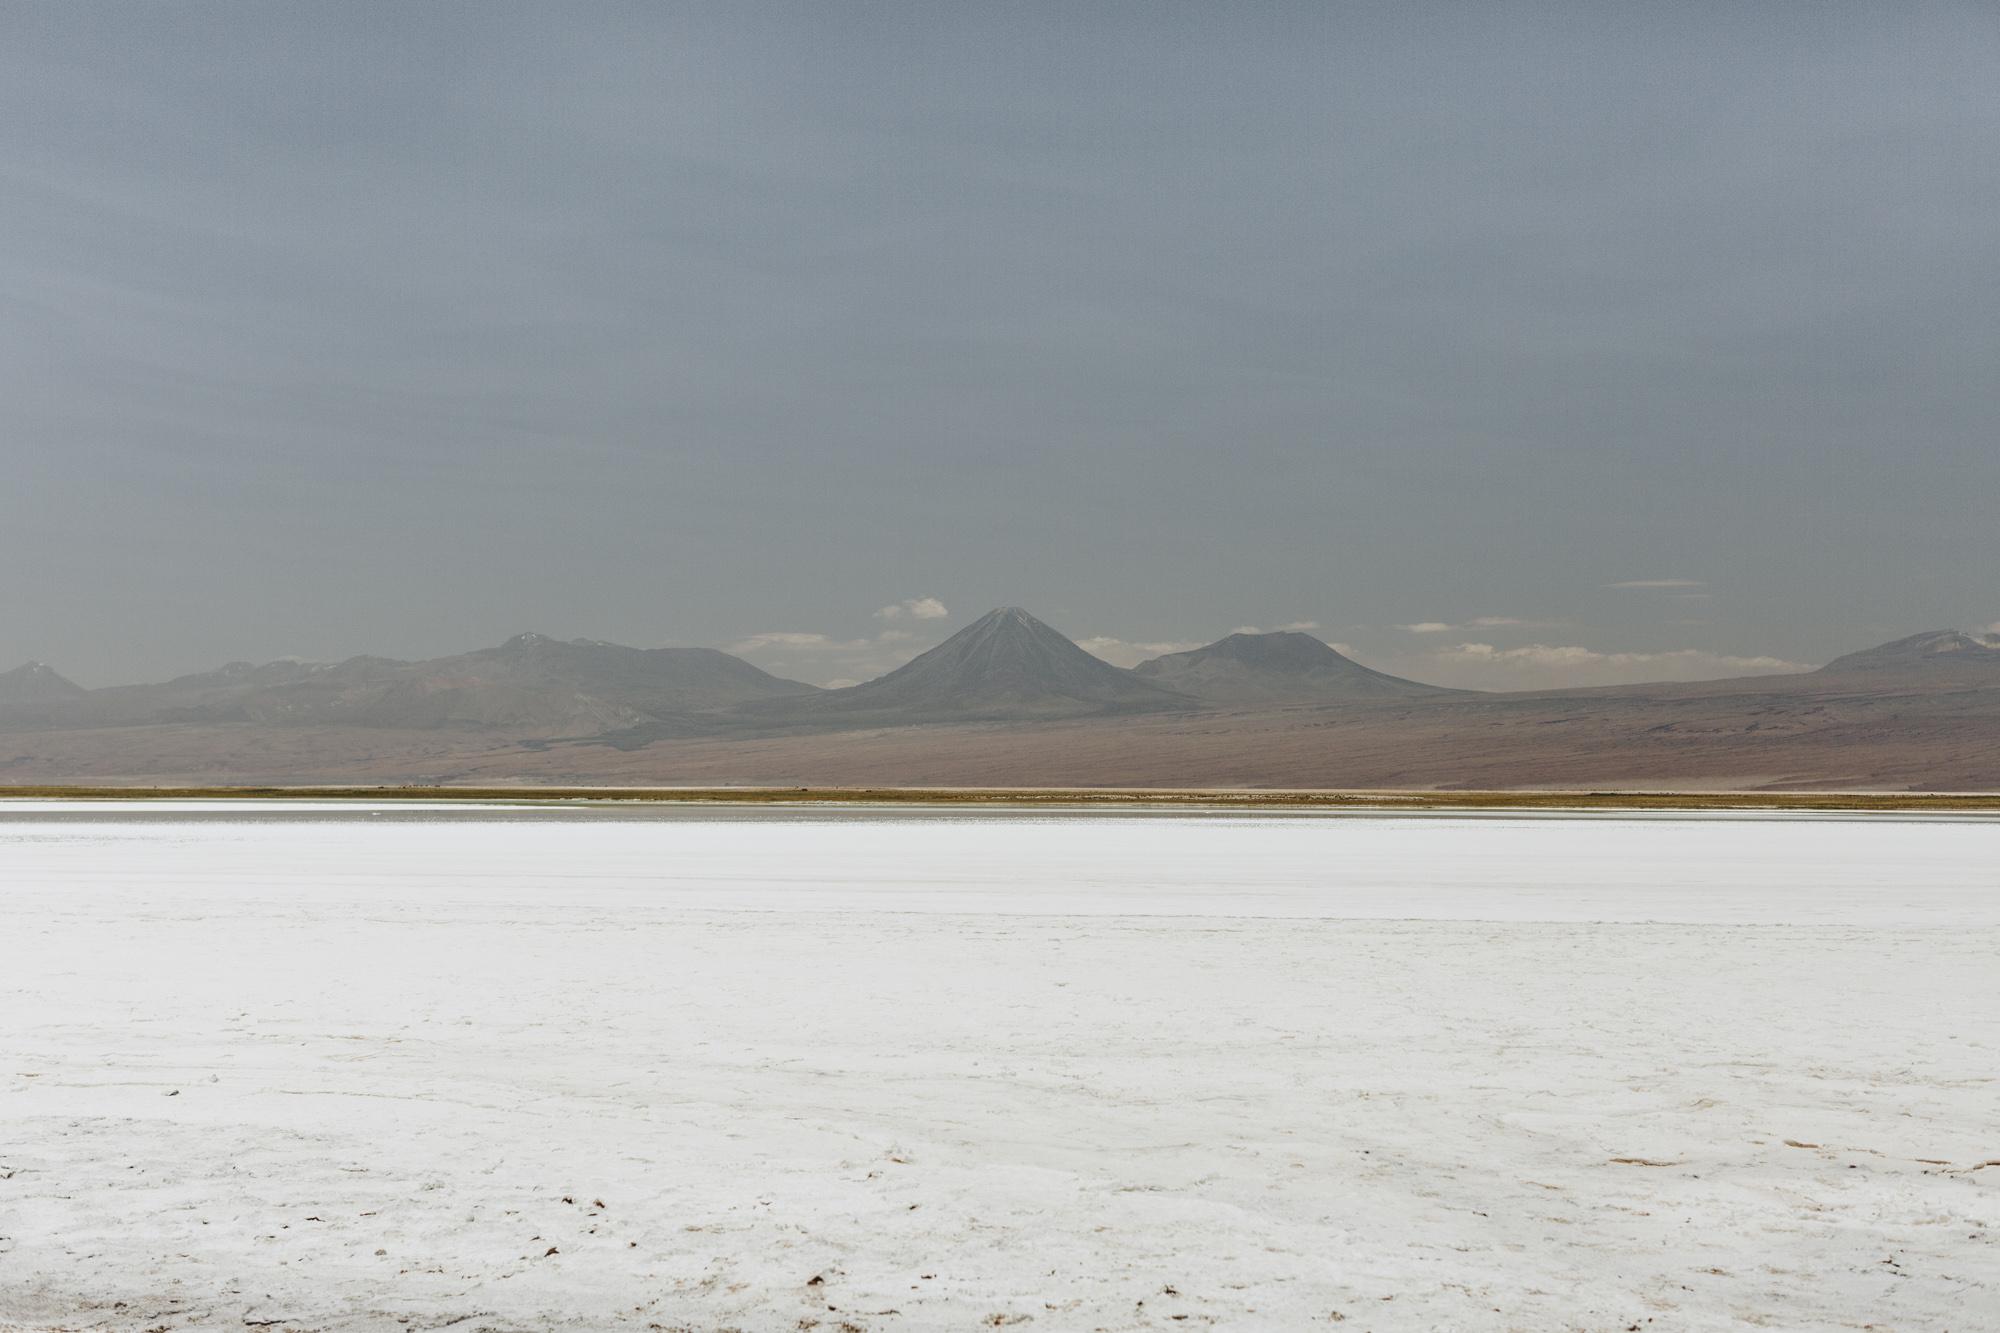 Mael Lambla photographer Chile San pedro atacama desert-102.jpg